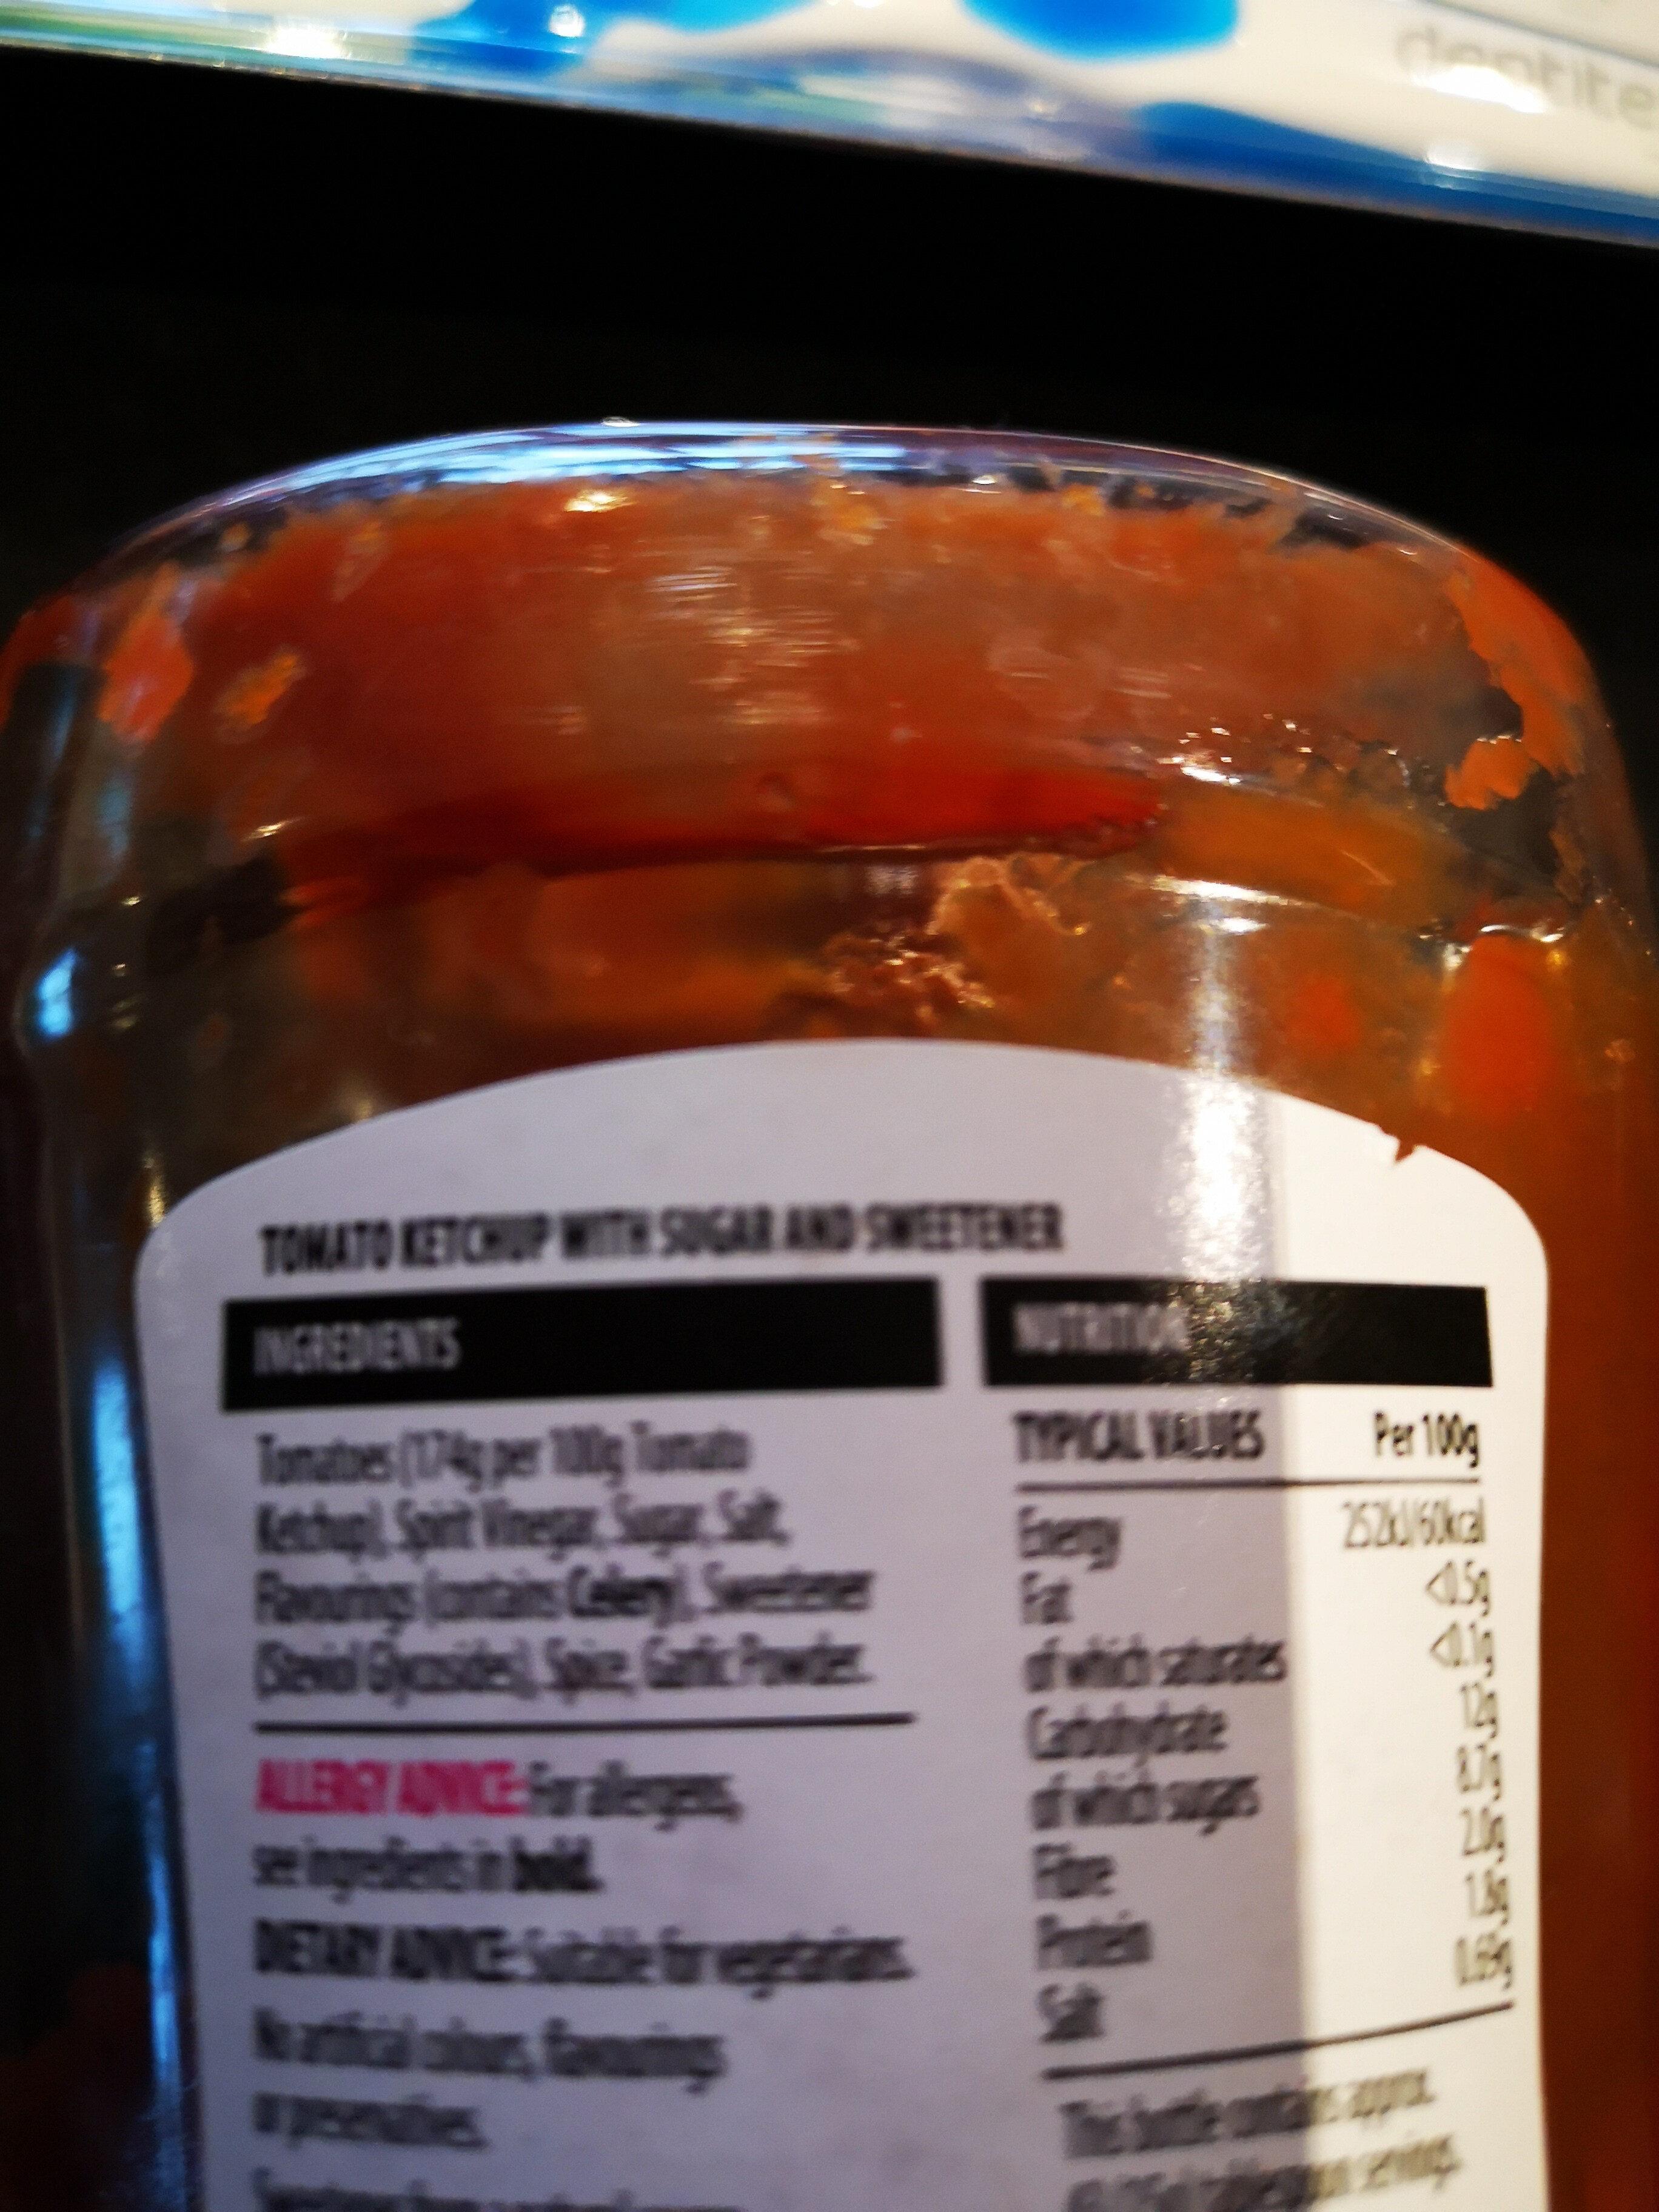 Tomato ketchup 50% less sugar and salt - Ingrédients